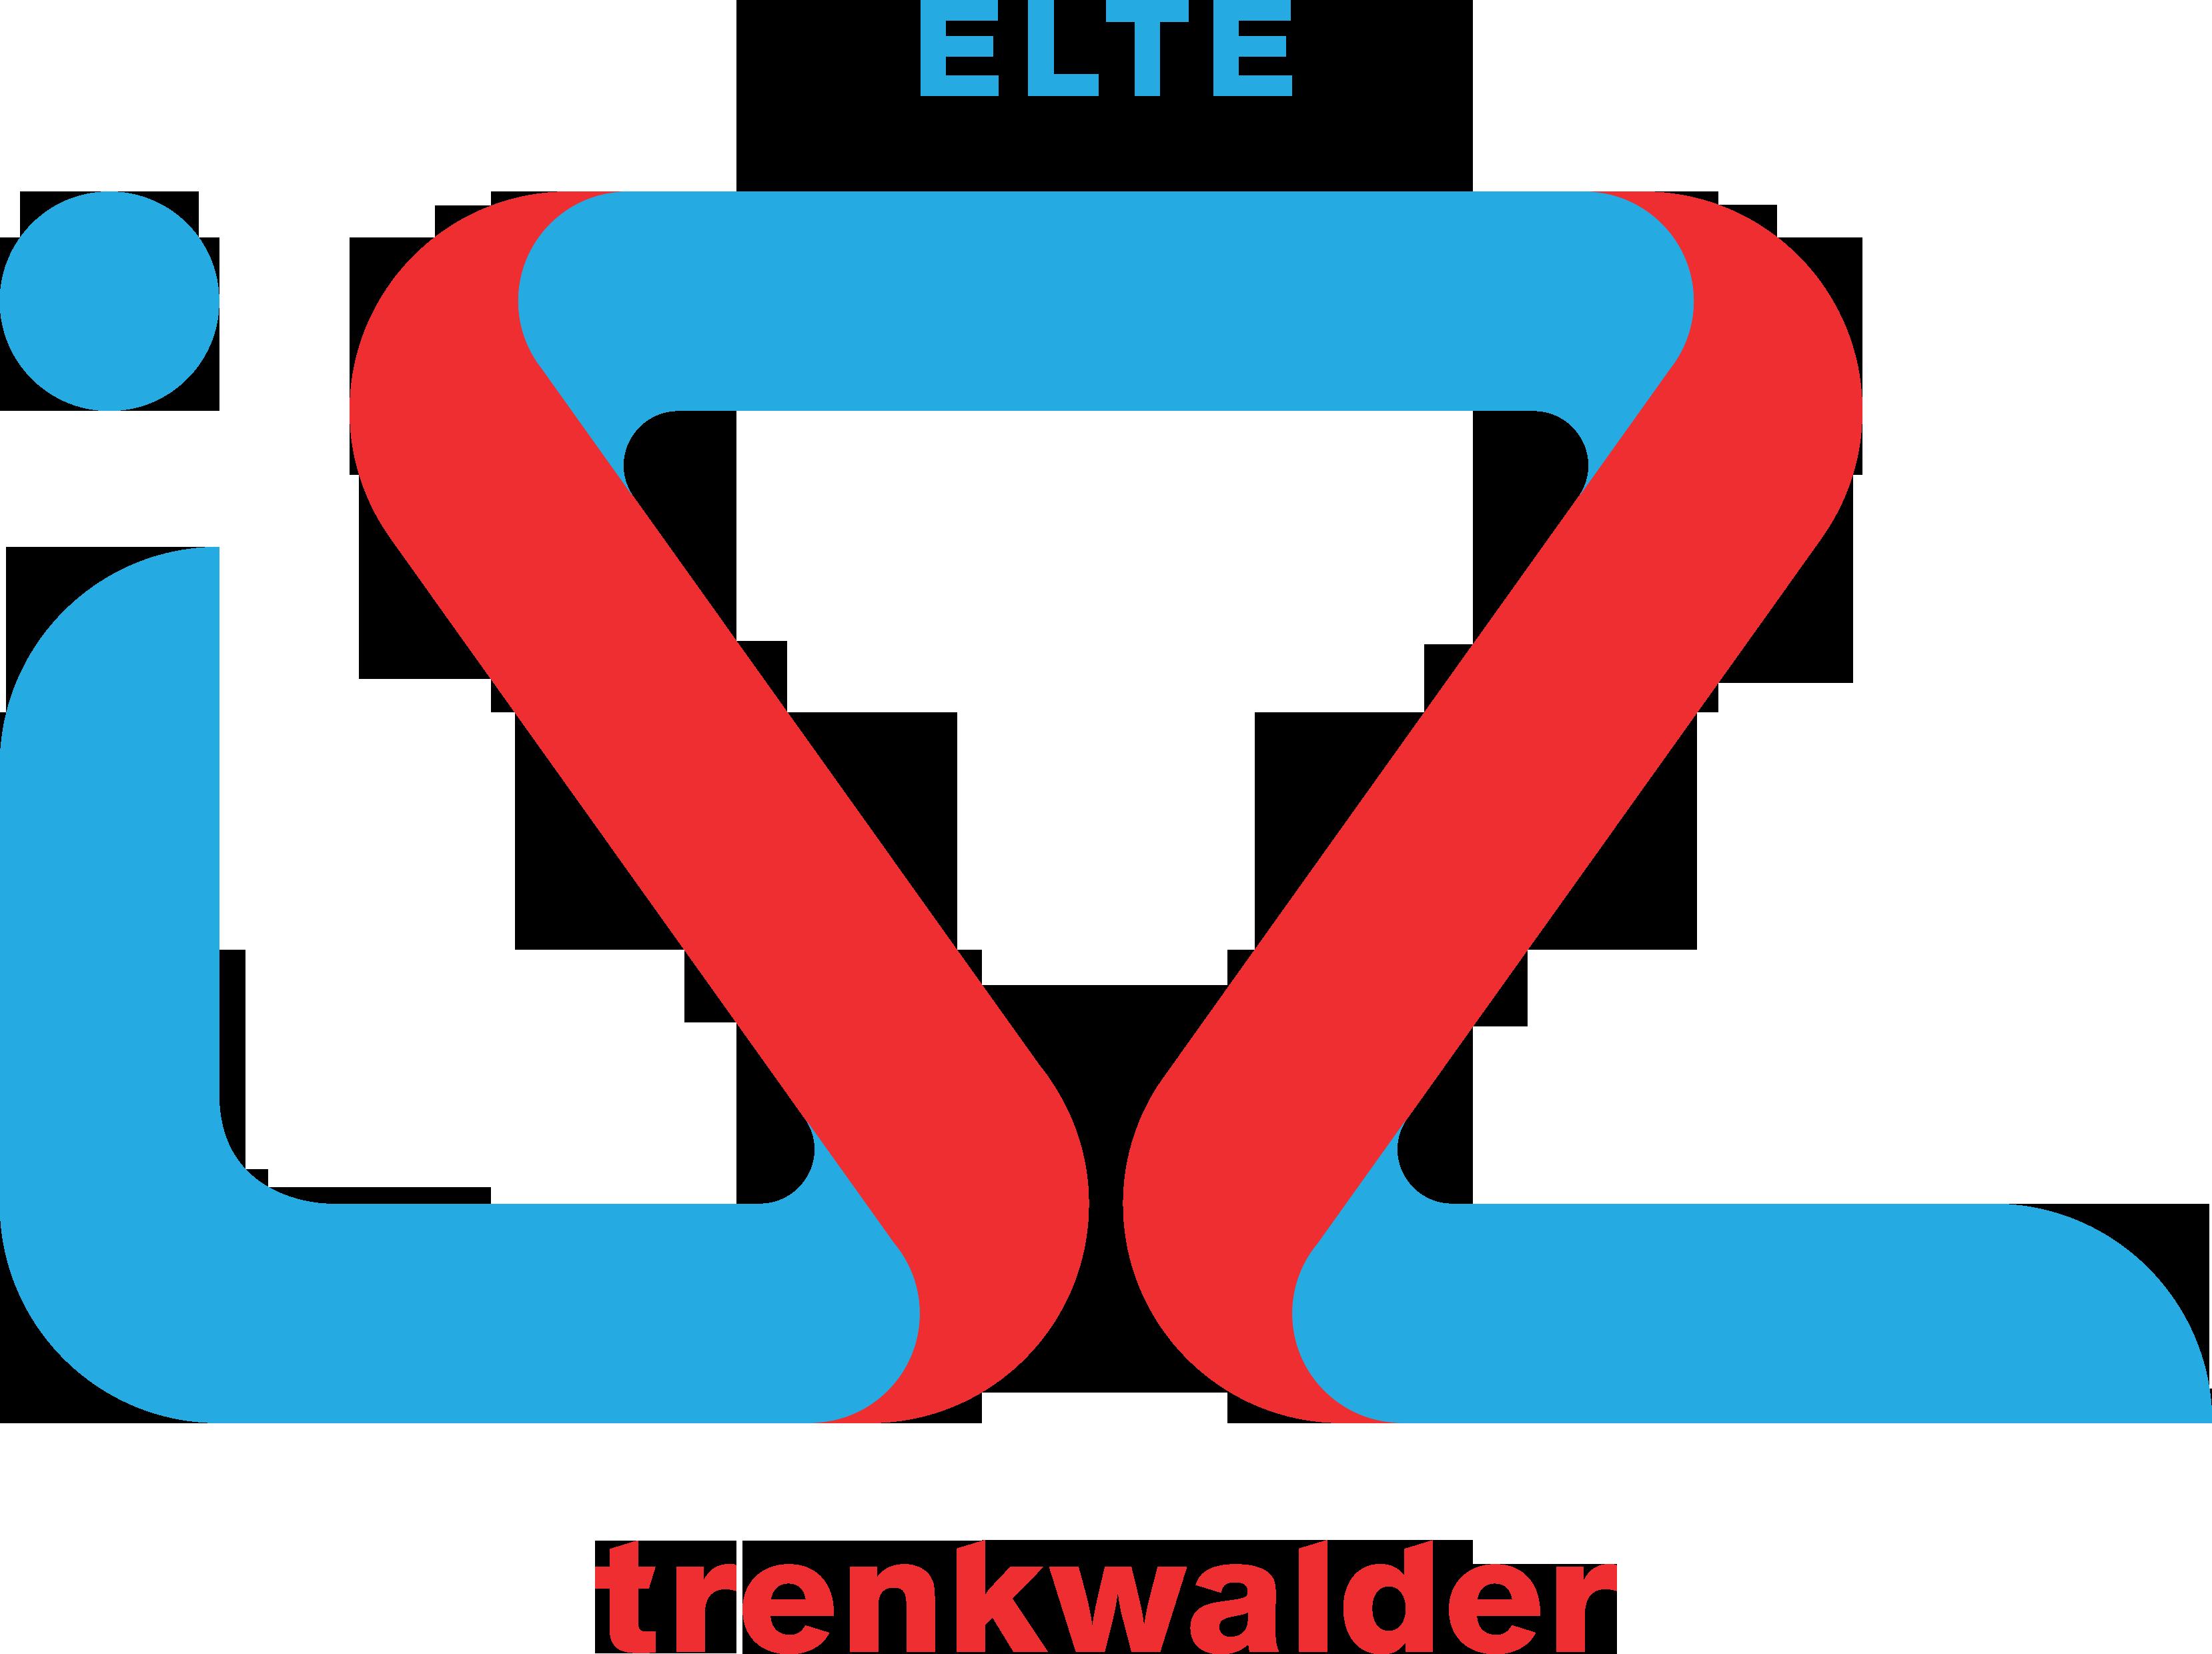 ELTE-Trenkwalder Iskolaszövetkezet